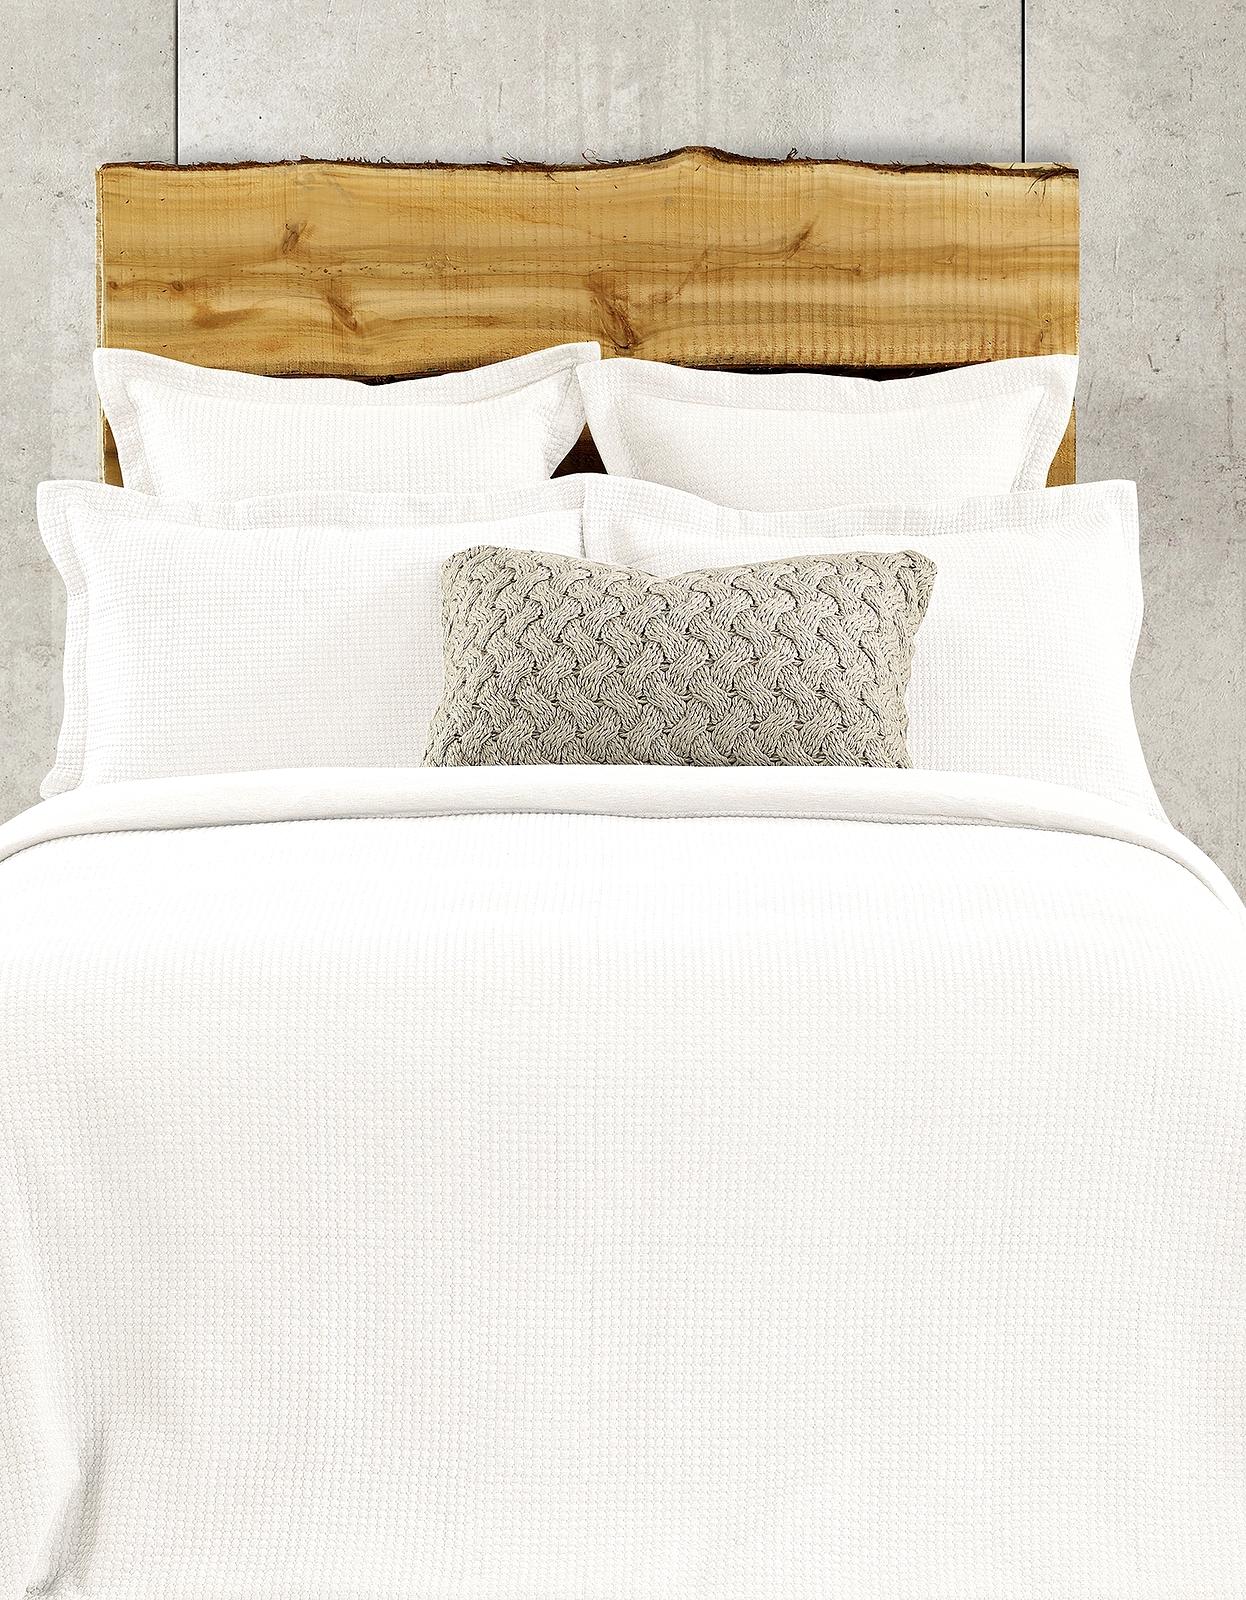 montana set duvet pin covers chocolate comforter bedding rustic morning plaid